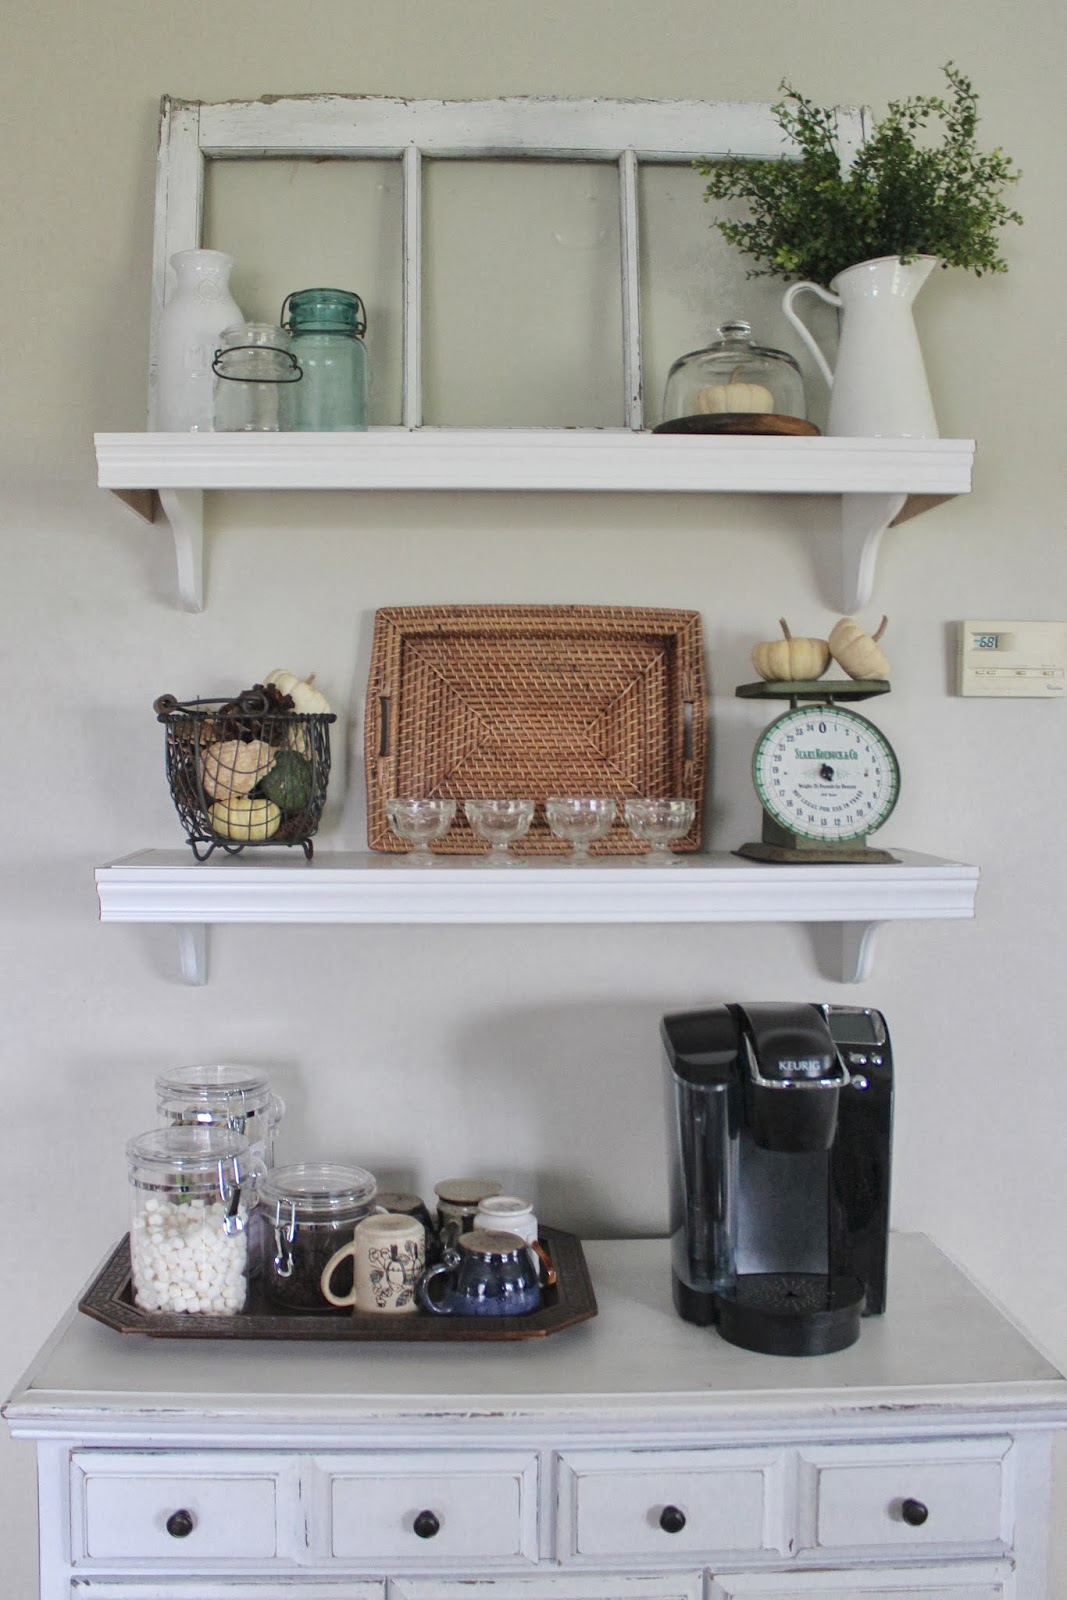 Kitchen Wall Shelf Home Depot Appliances Behind The Red Barn Door Shelves